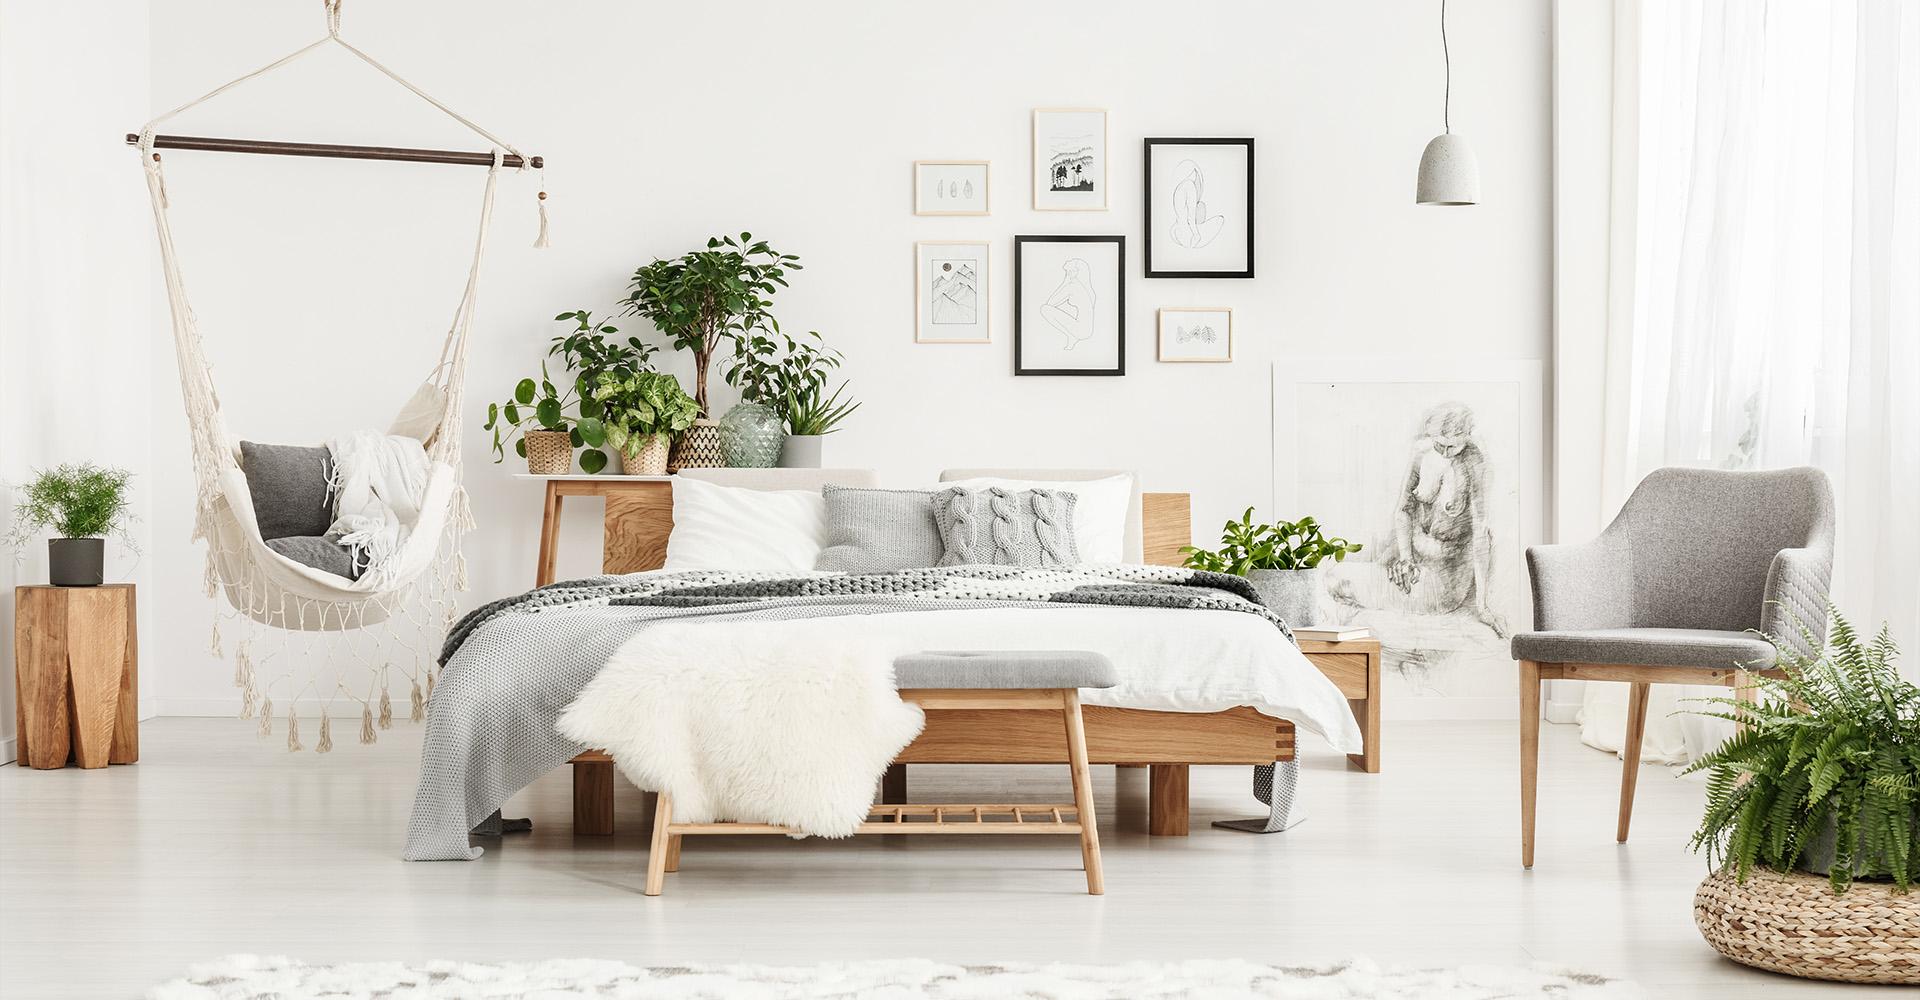 Top Master bedroom interior designers in HSR Layout